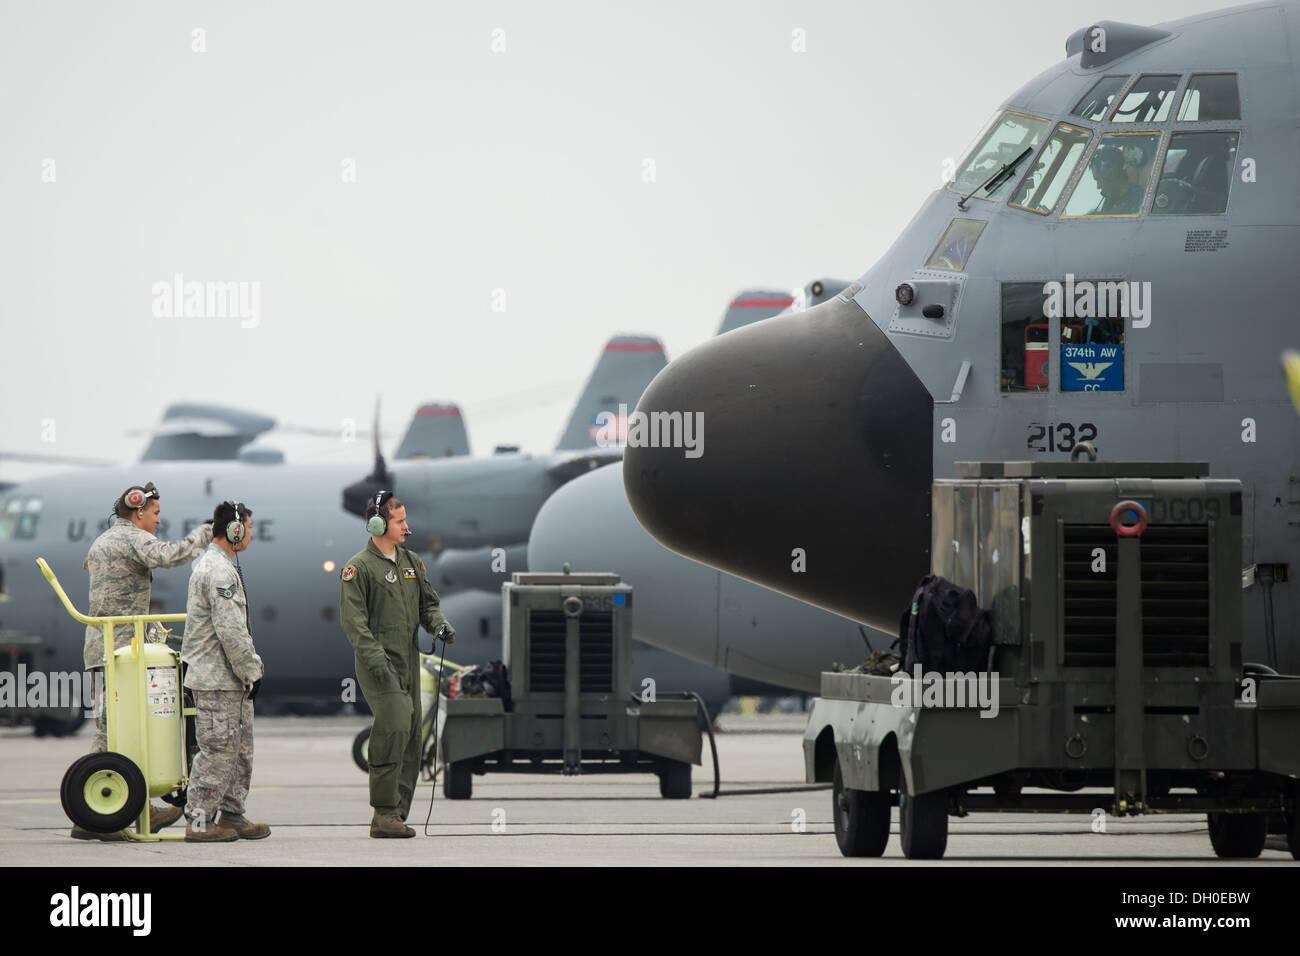 Airmen perform a preflight inspection by a C-130 Hercules at Yokota Air Base, Japan, Oct. 22, 2013. Ten C-130 Hercules from the - Stock Image